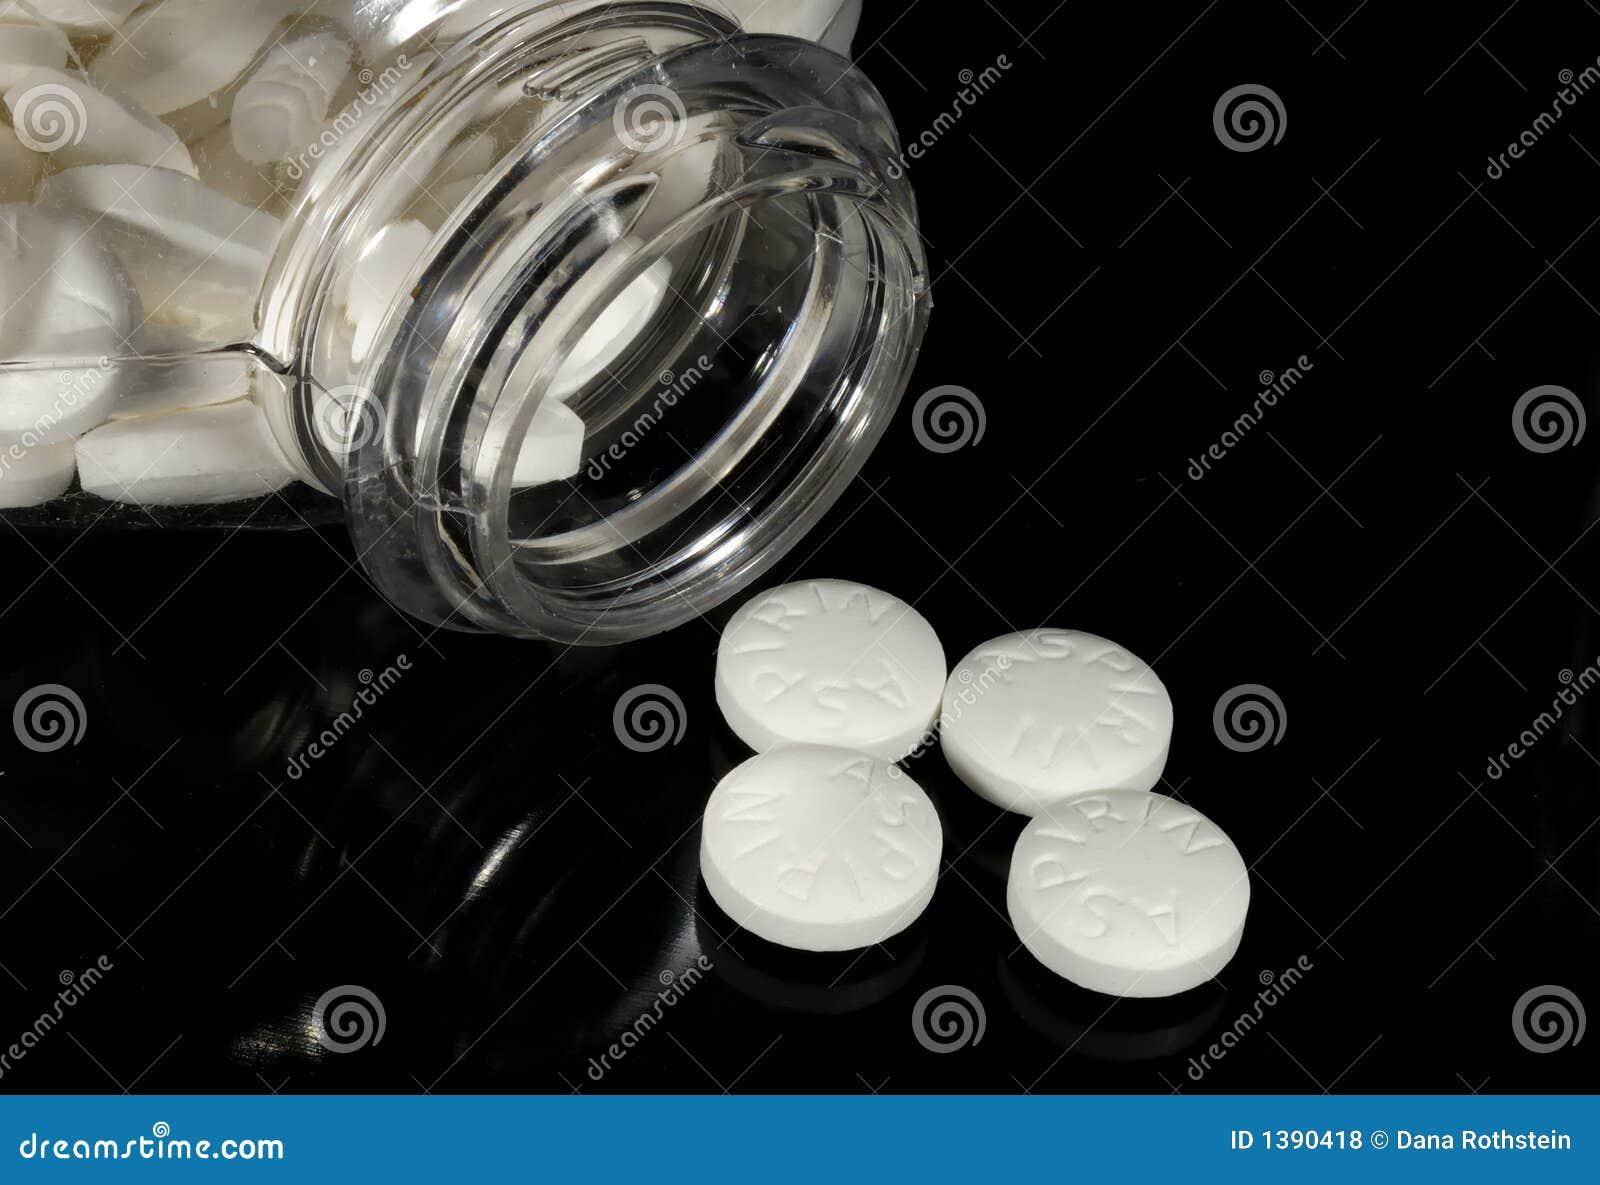 Aspiryny.